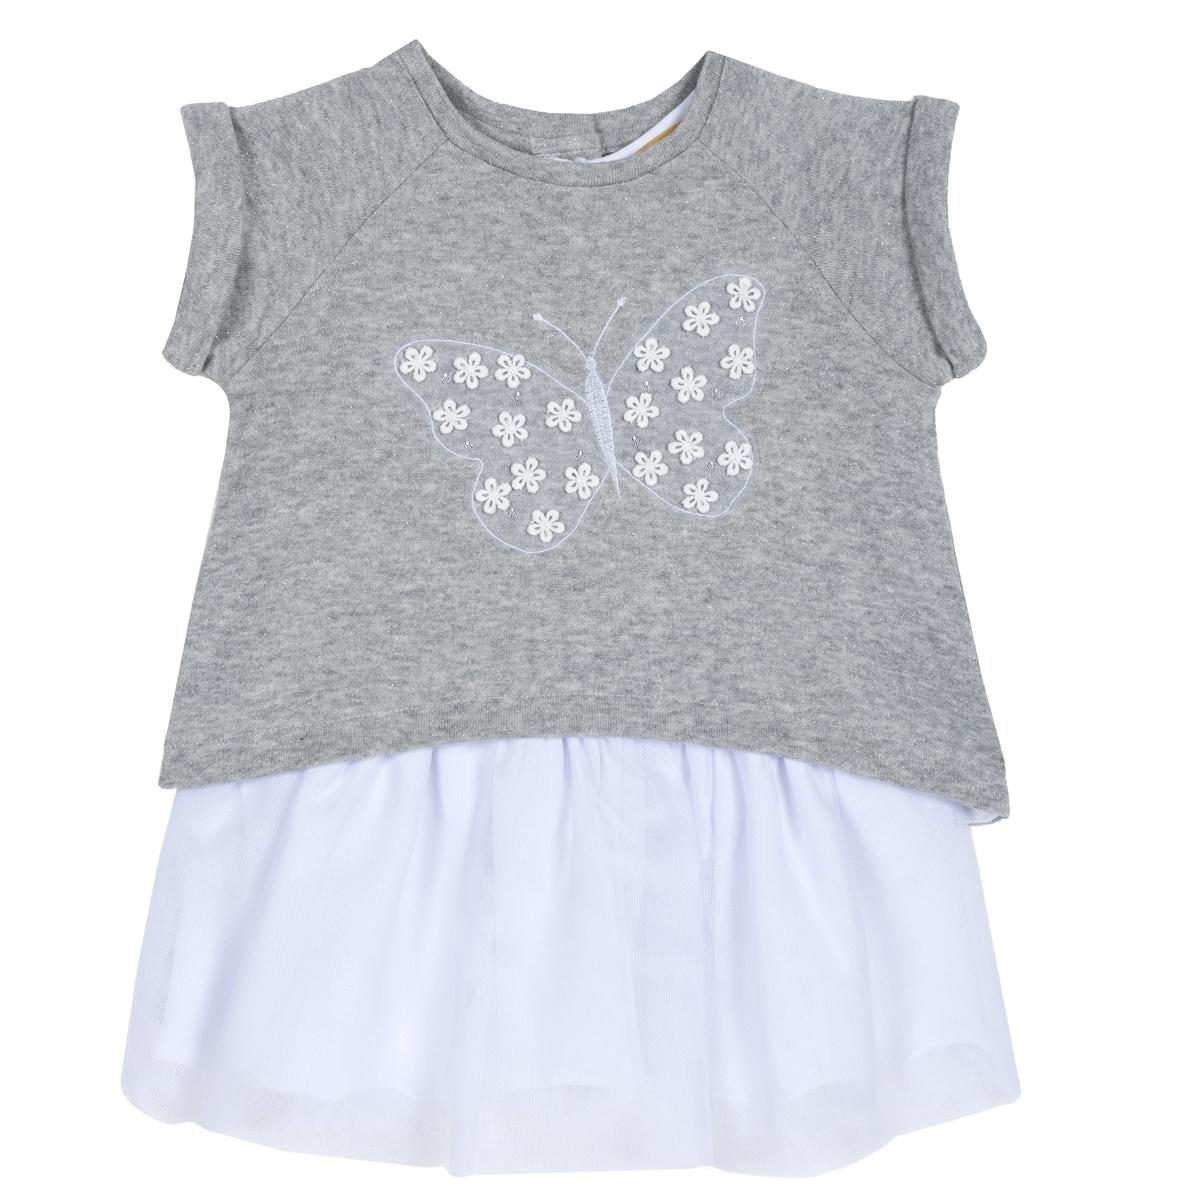 Set rochita si tricou copii Chicco, gri inchis, 76267